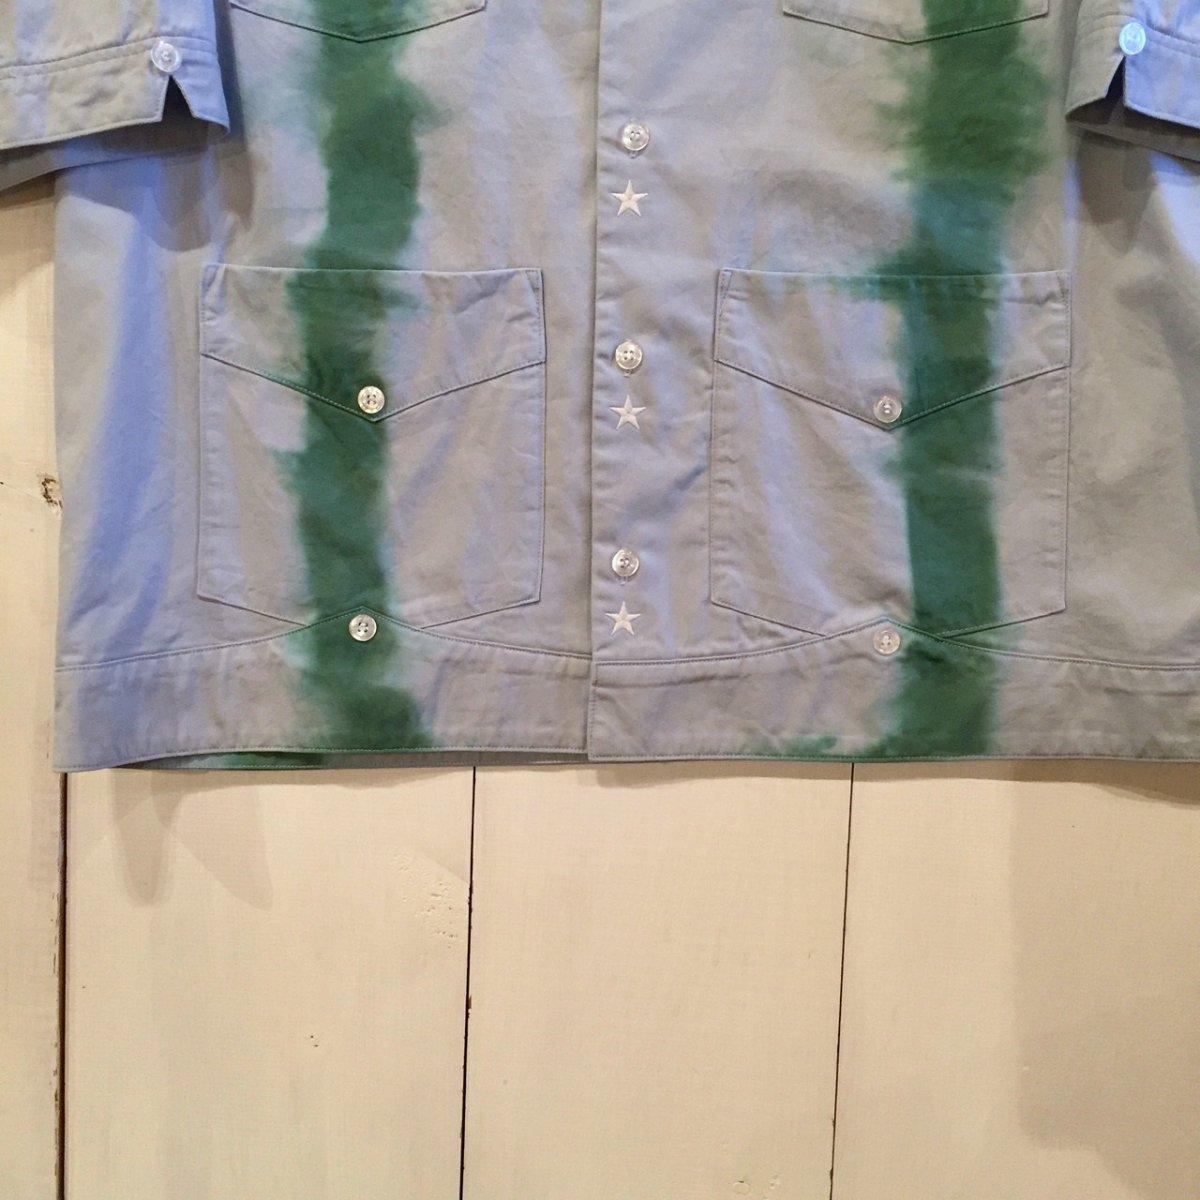 <img class='new_mark_img1' src='https://img.shop-pro.jp/img/new/icons24.gif' style='border:none;display:inline;margin:0px;padding:0px;width:auto;' />【SALE / 30%OFF】Black weirdos  ブラック ウィドー / 半袖シャツ TieDye Cuba Shirt 【SKY】